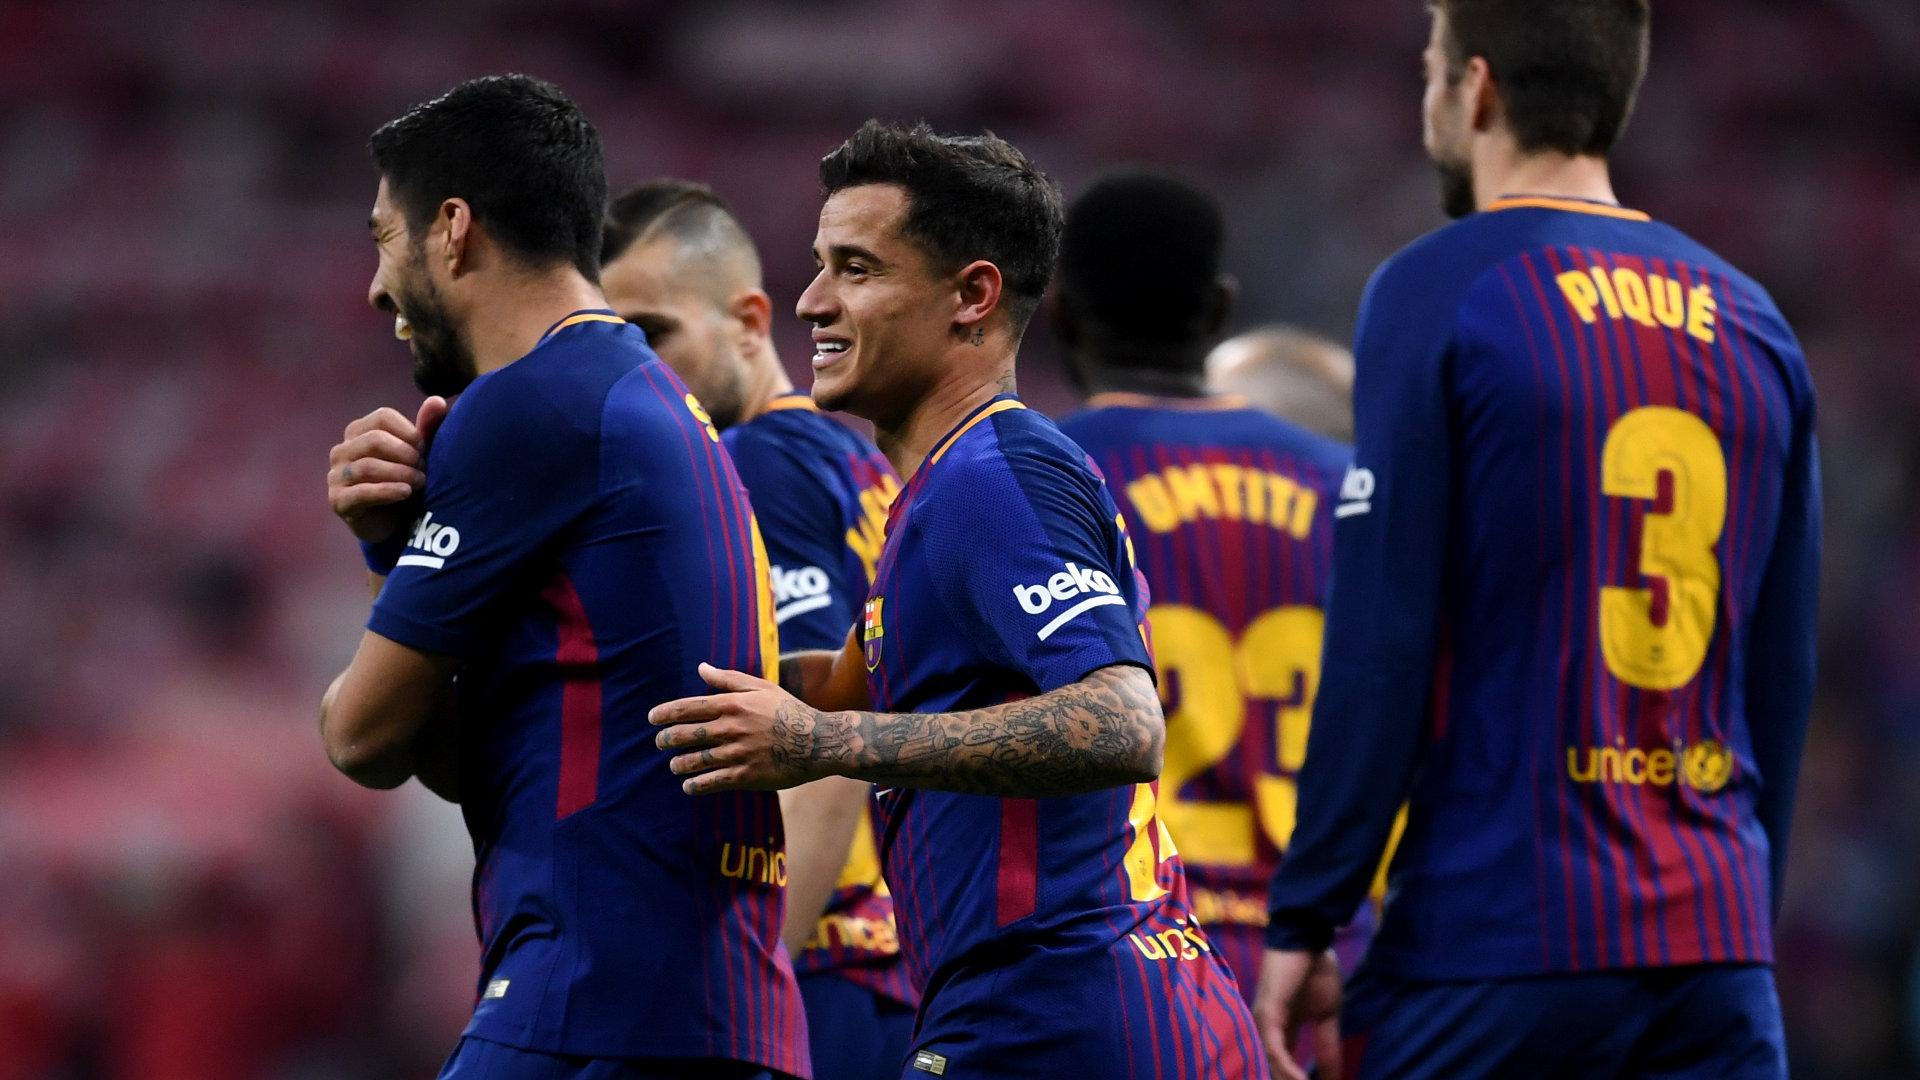 Coutinho Suarez Pique Sevilla Barcelona 21042018 Copa del Rey final